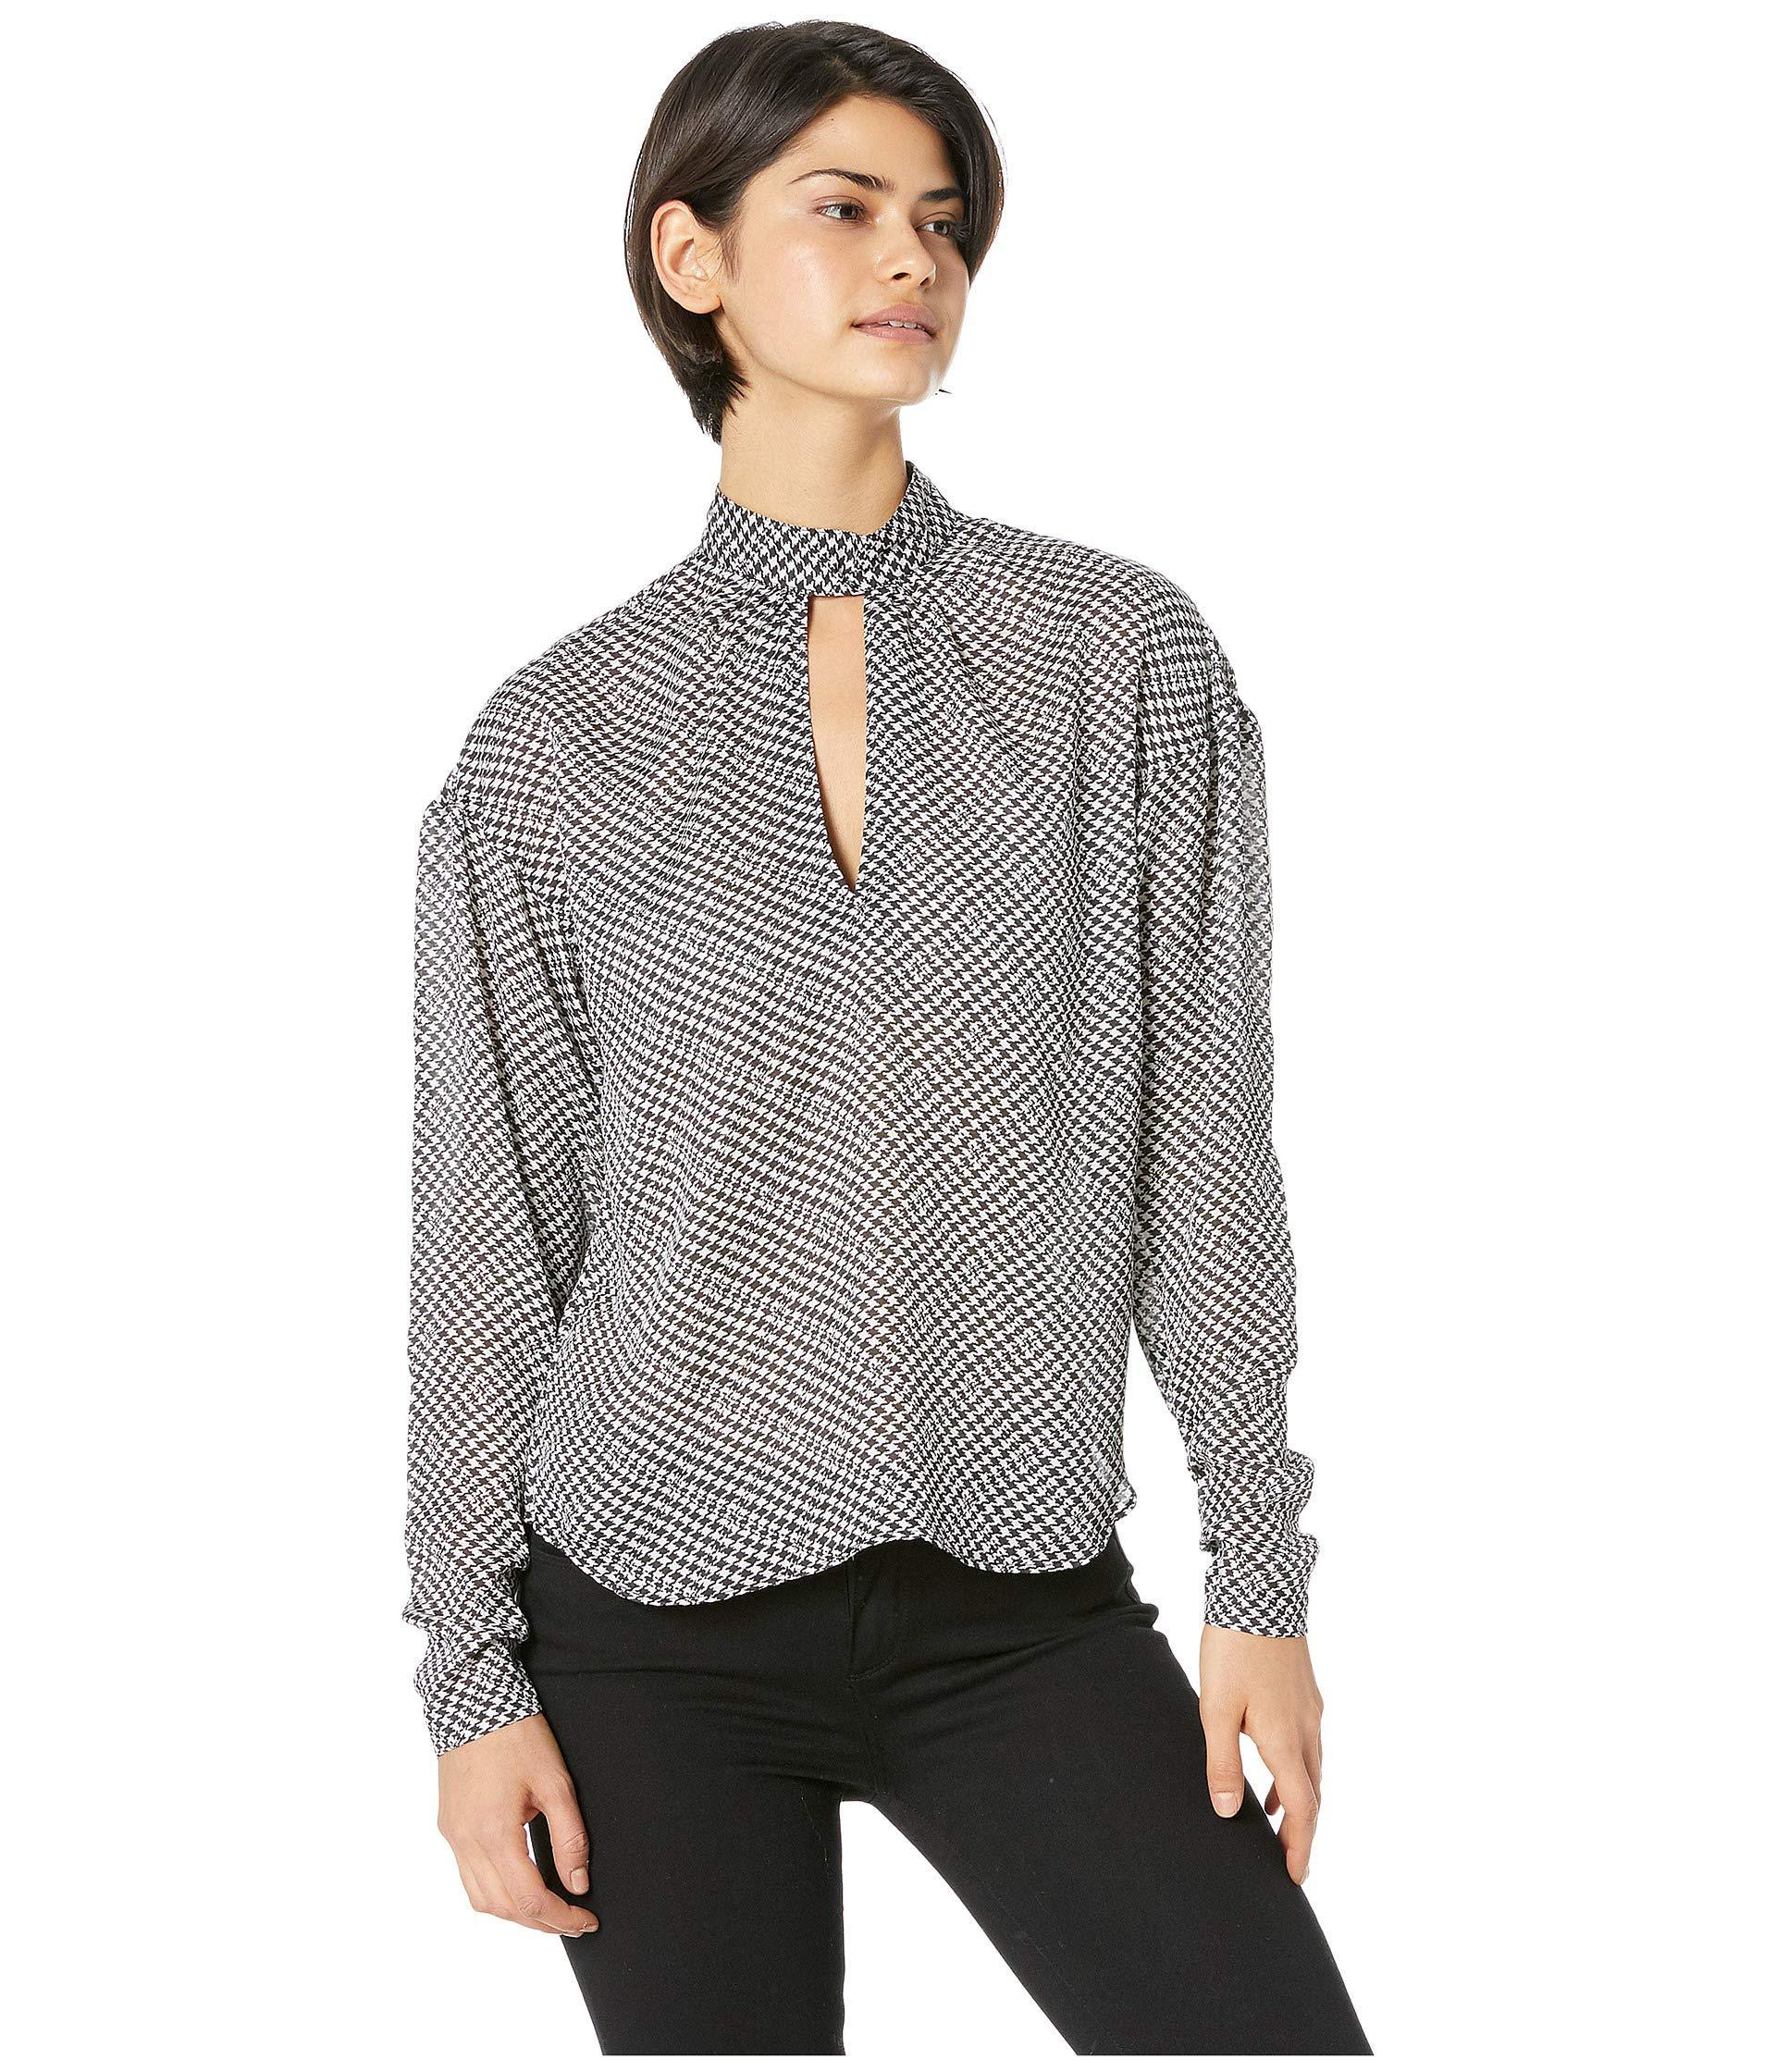 898576e7e0 Lyst - Joie Deianira (caviar) Women s Clothing in Gray